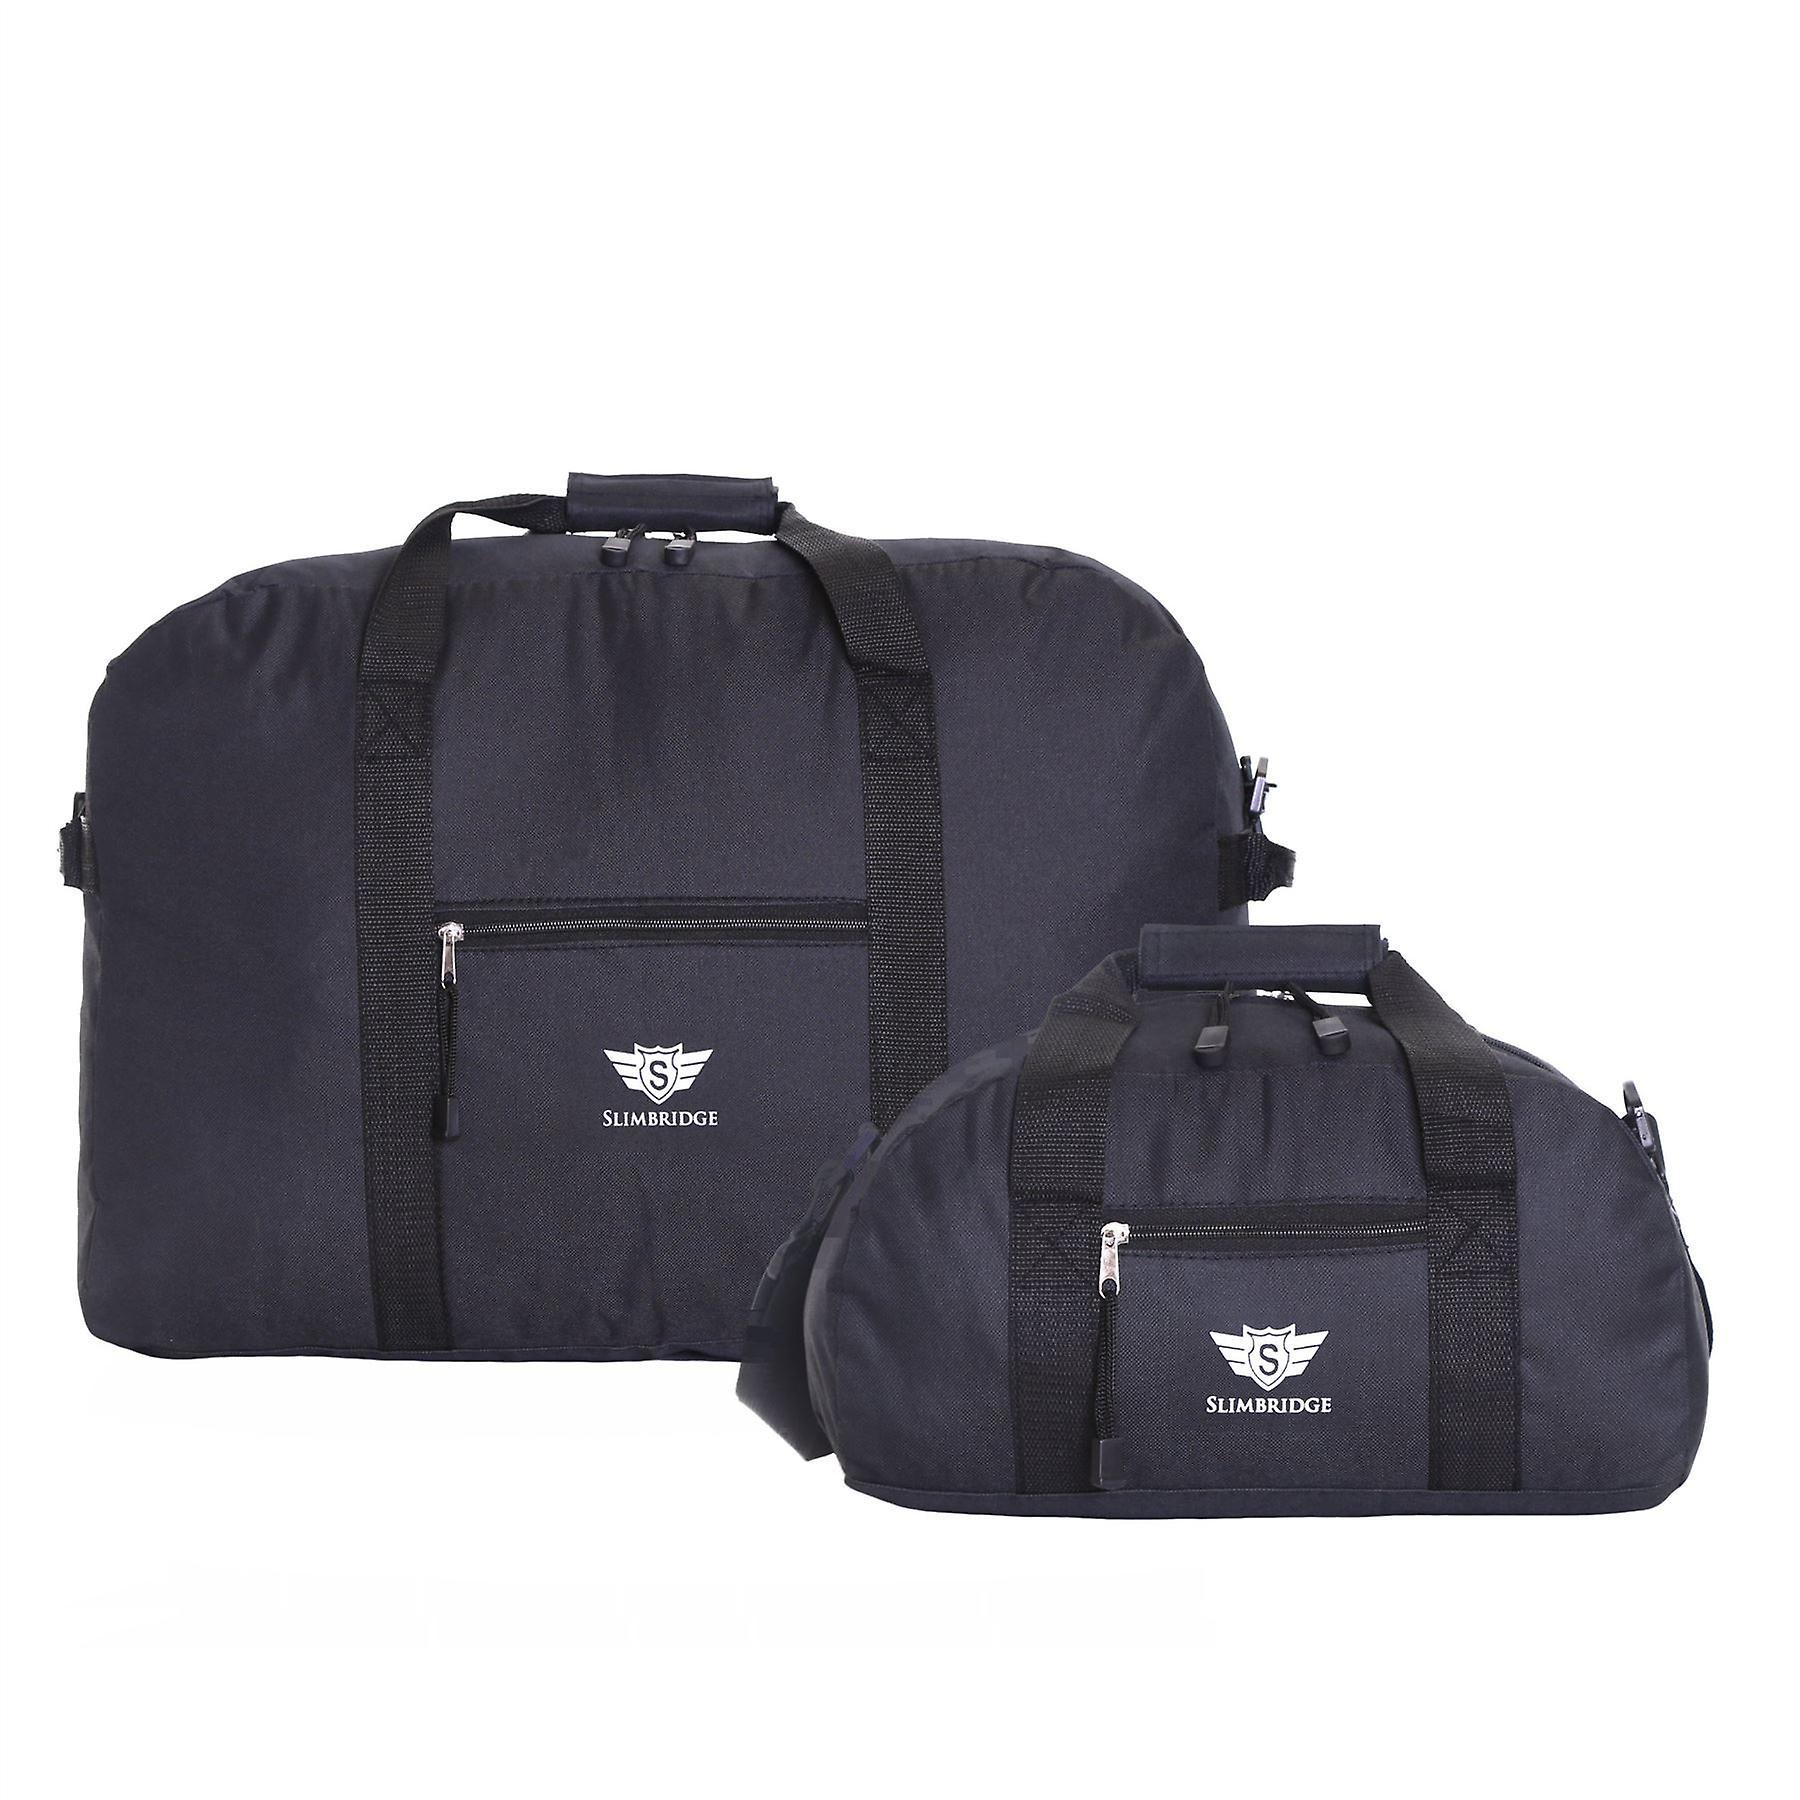 Slimbridge Ryanair Set of 2 Cabin Bags, Black 55 x 40 x 20 cm and 35 x 20 x 20 cm